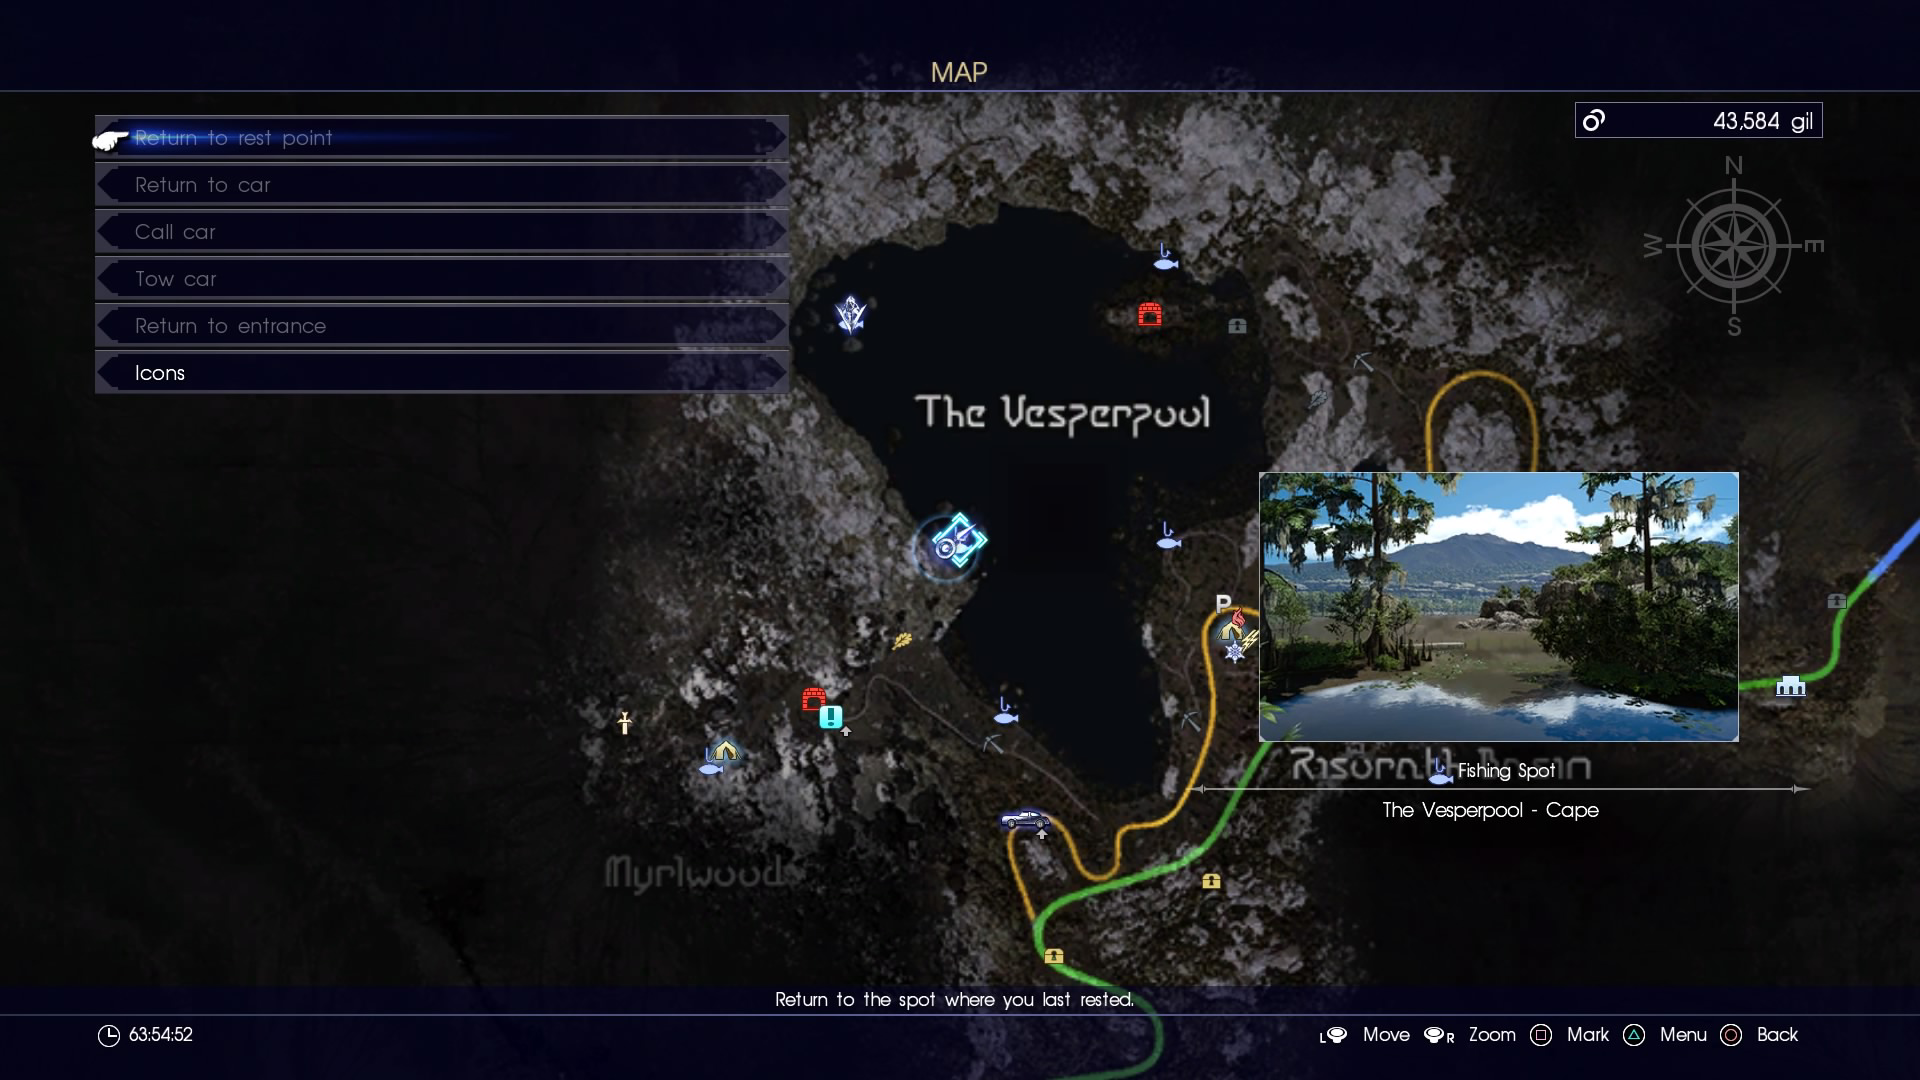 Vesperpool final fantasy wiki fandom powered by wikia for Final fantasy 15 fishing guide